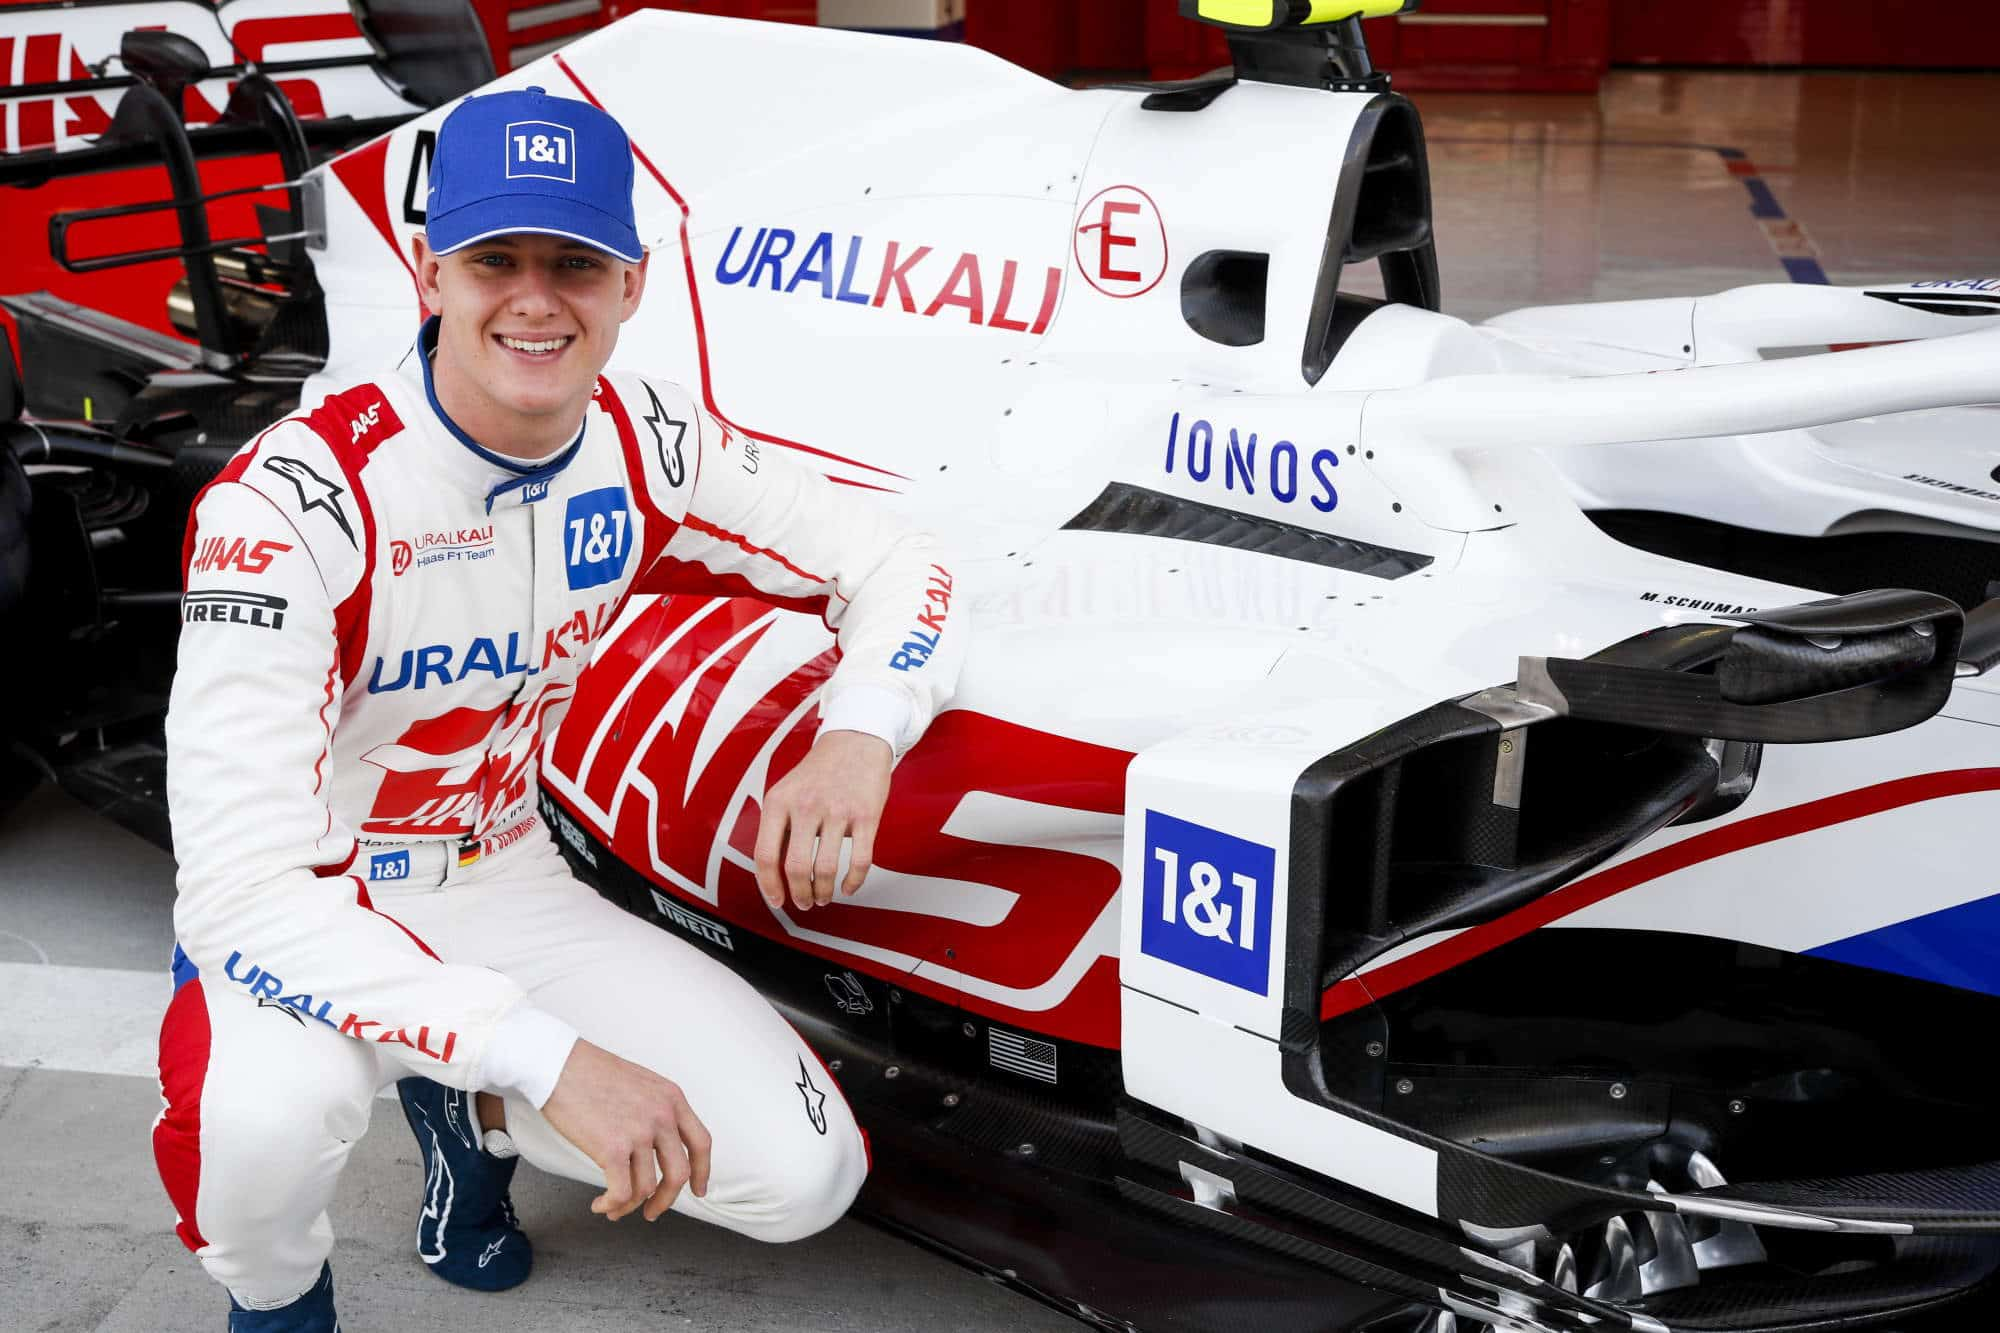 2021 Haas VF-21 unveal sidepod close shot Mick Schumacher Bahrain testing Photo Haas